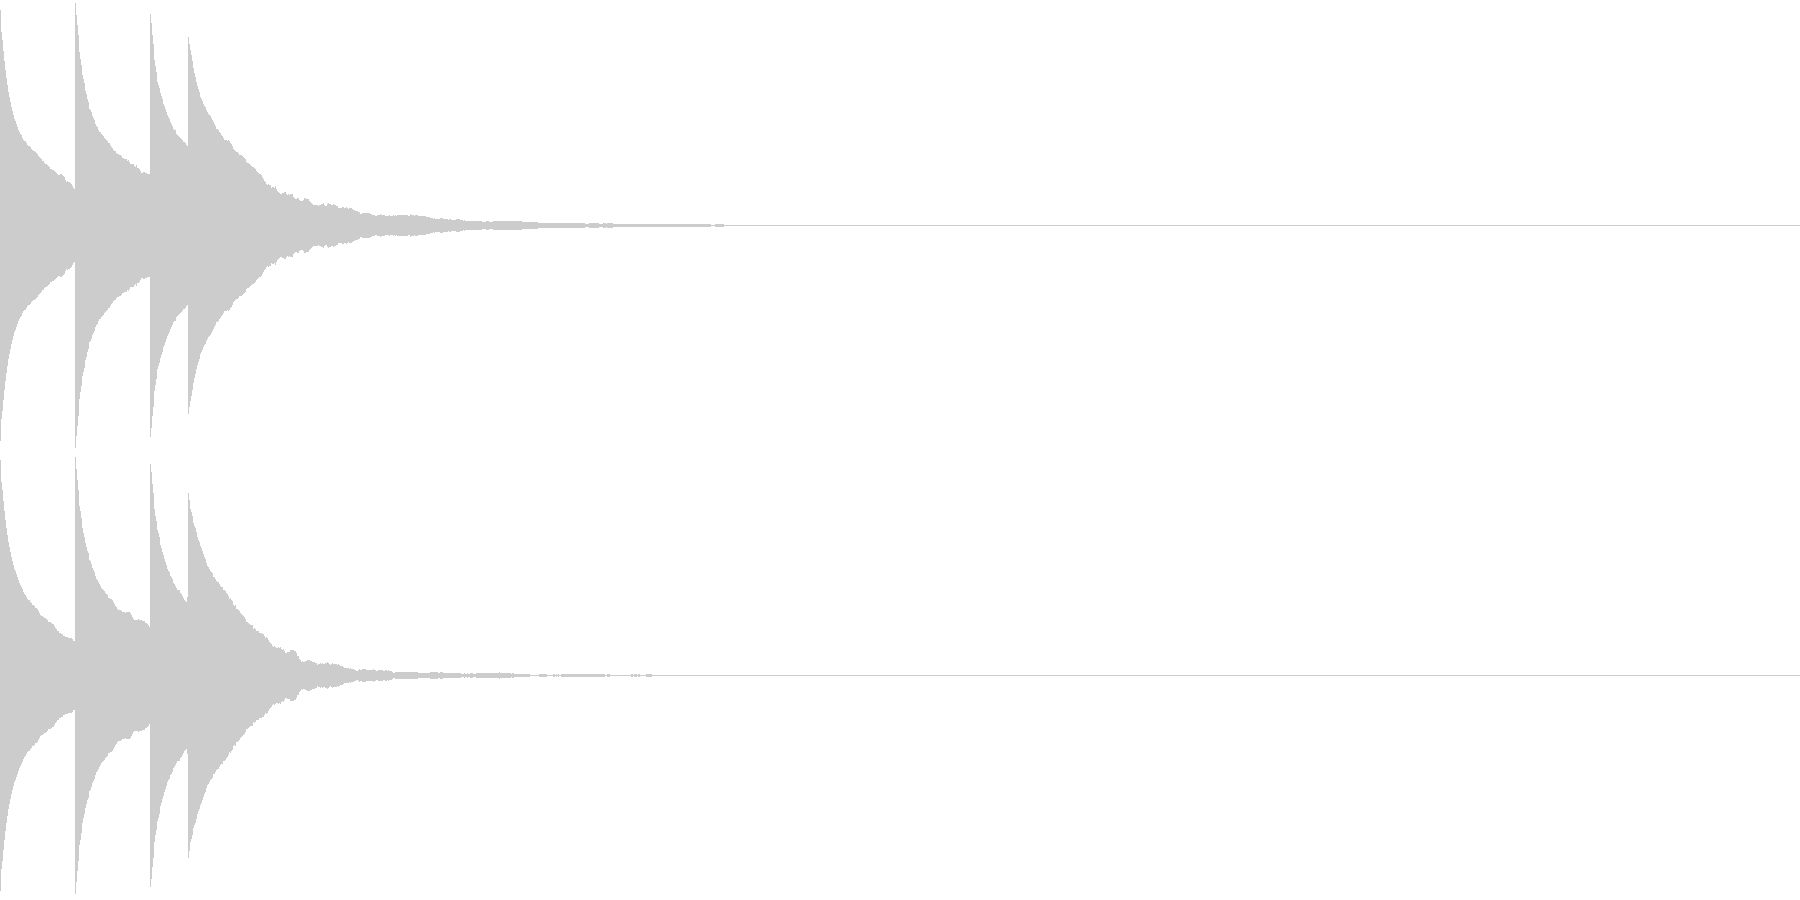 Bank 汎用性のある通知・認証音 6の未再生の波形